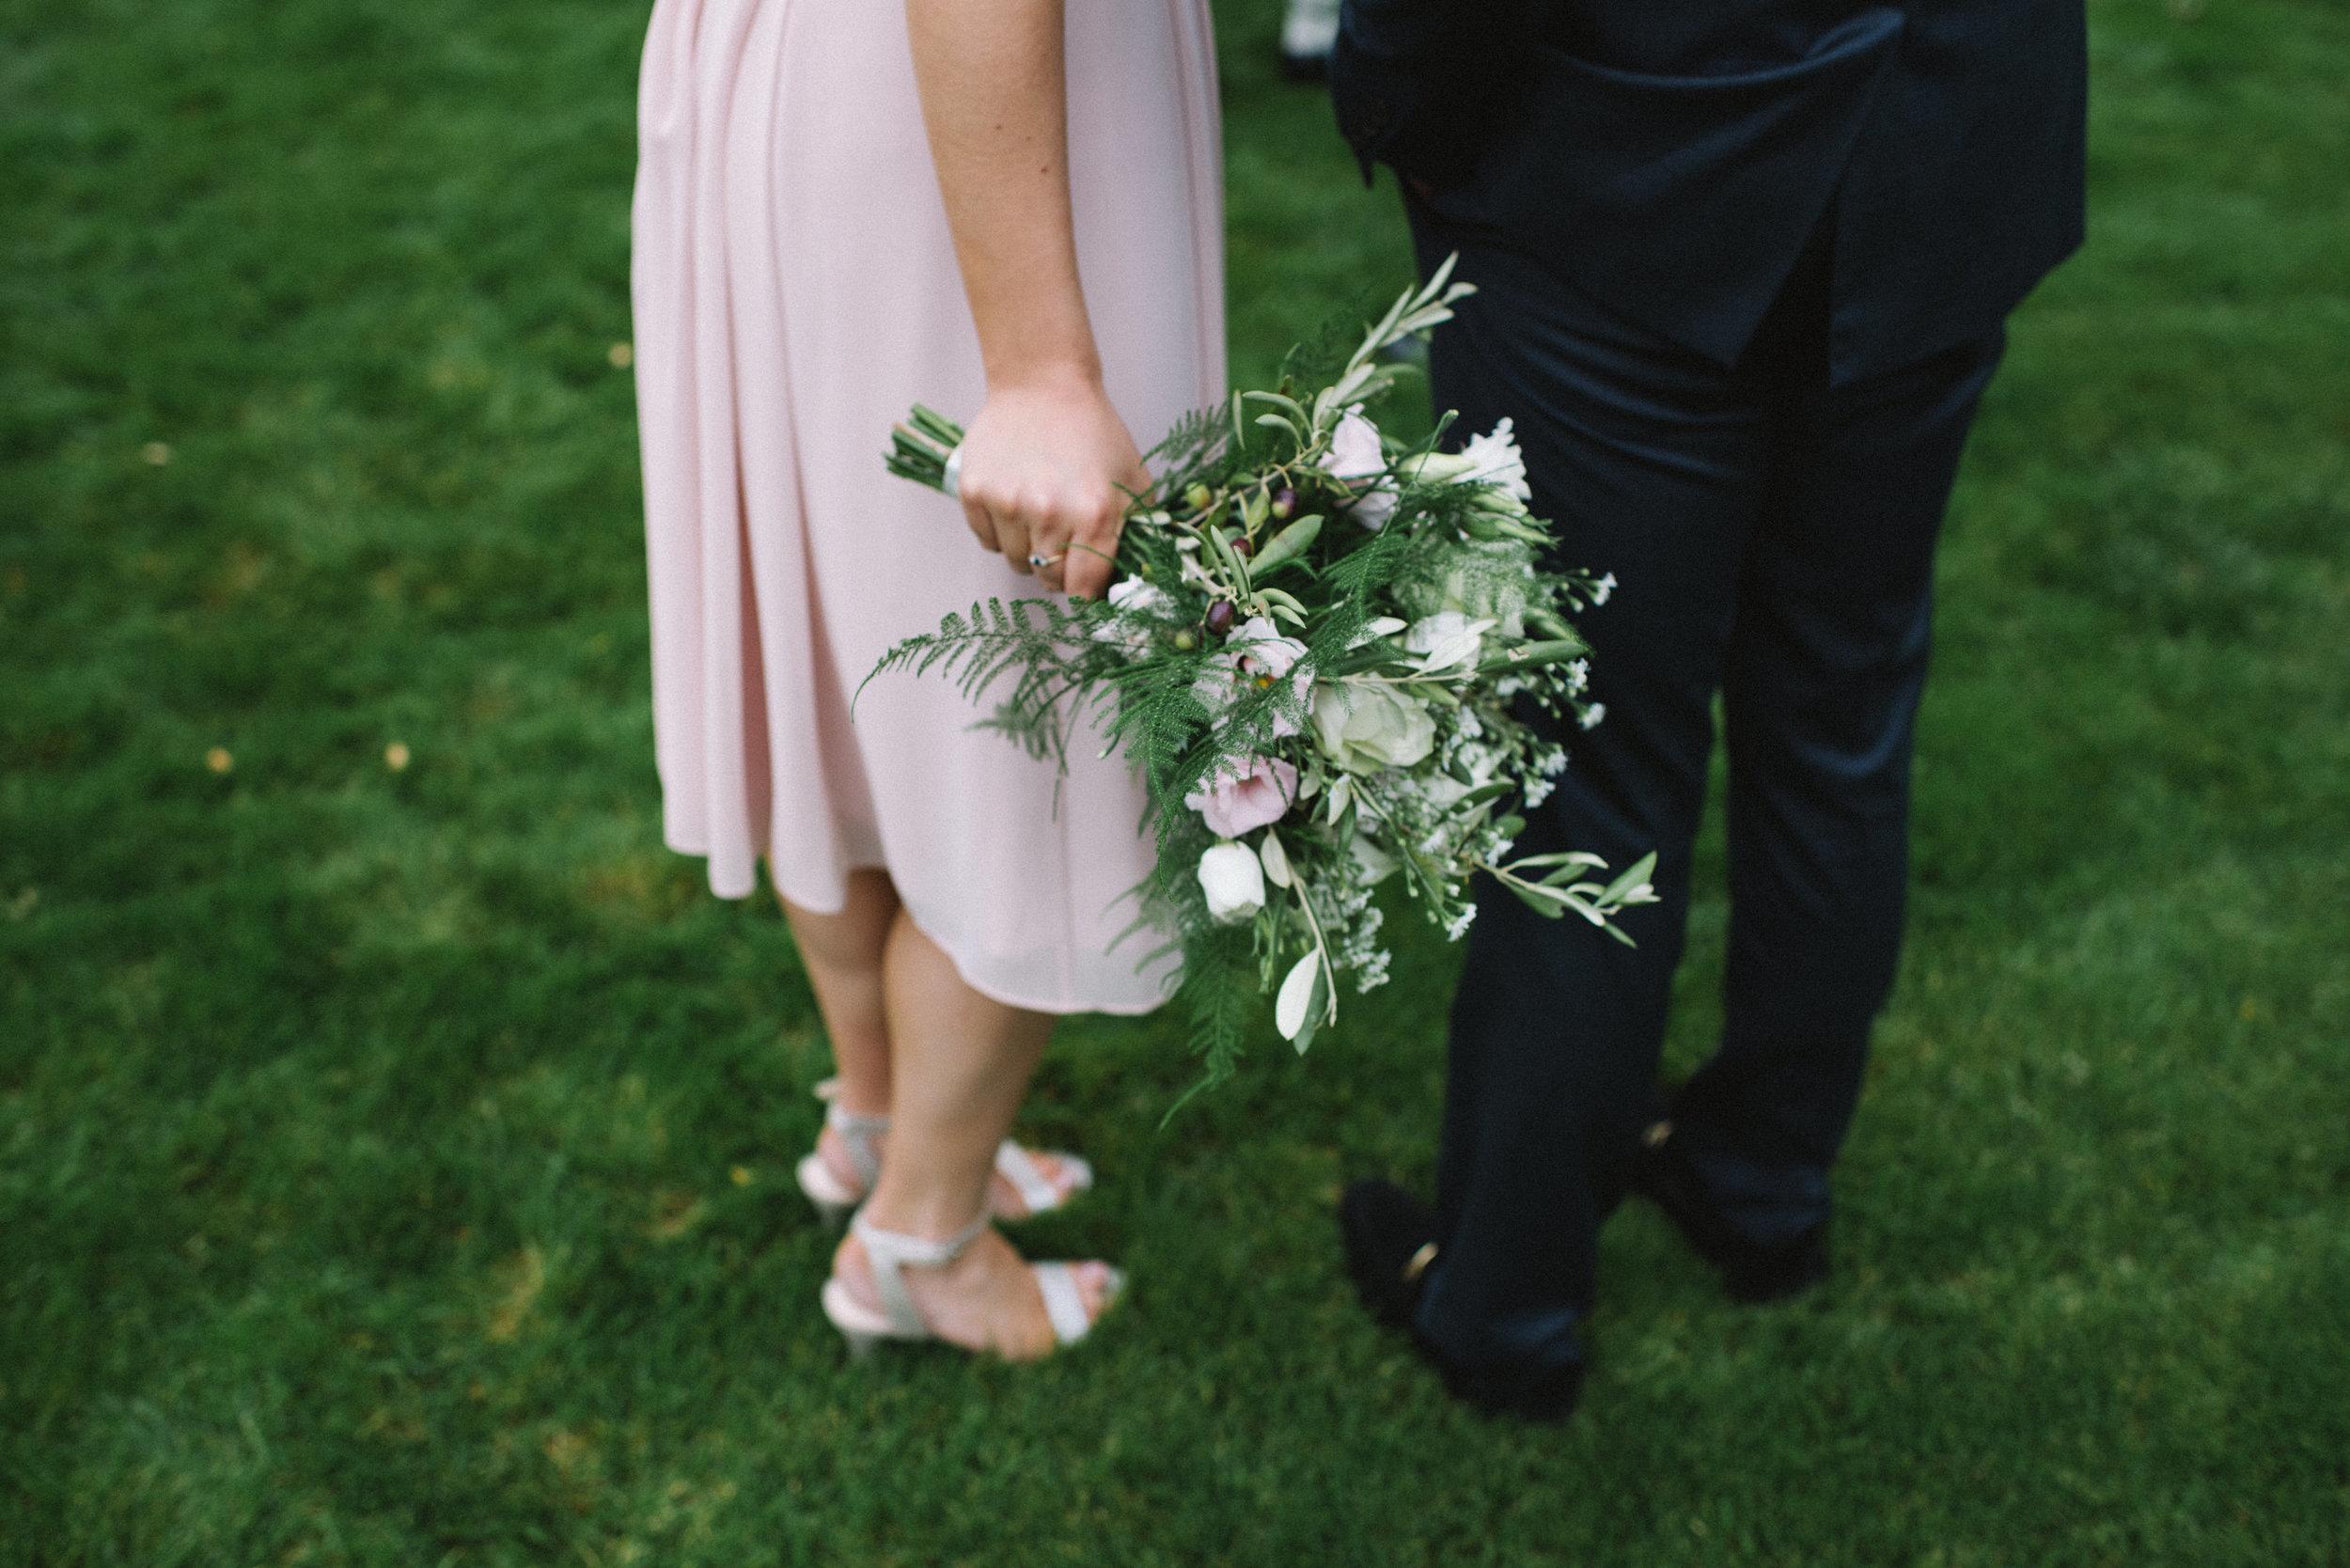 0071-LISA-DEVINE-PHOTOGRAPHY-ALTERNATIVE-WEDDING-PHOTOGRAPHY-SCOTLAND-DESTINATION-WEDDINGS-GLASGOW-WEDDINGS-COOL-WEDDINGS-STYLISH-WEDDINGS.JPG